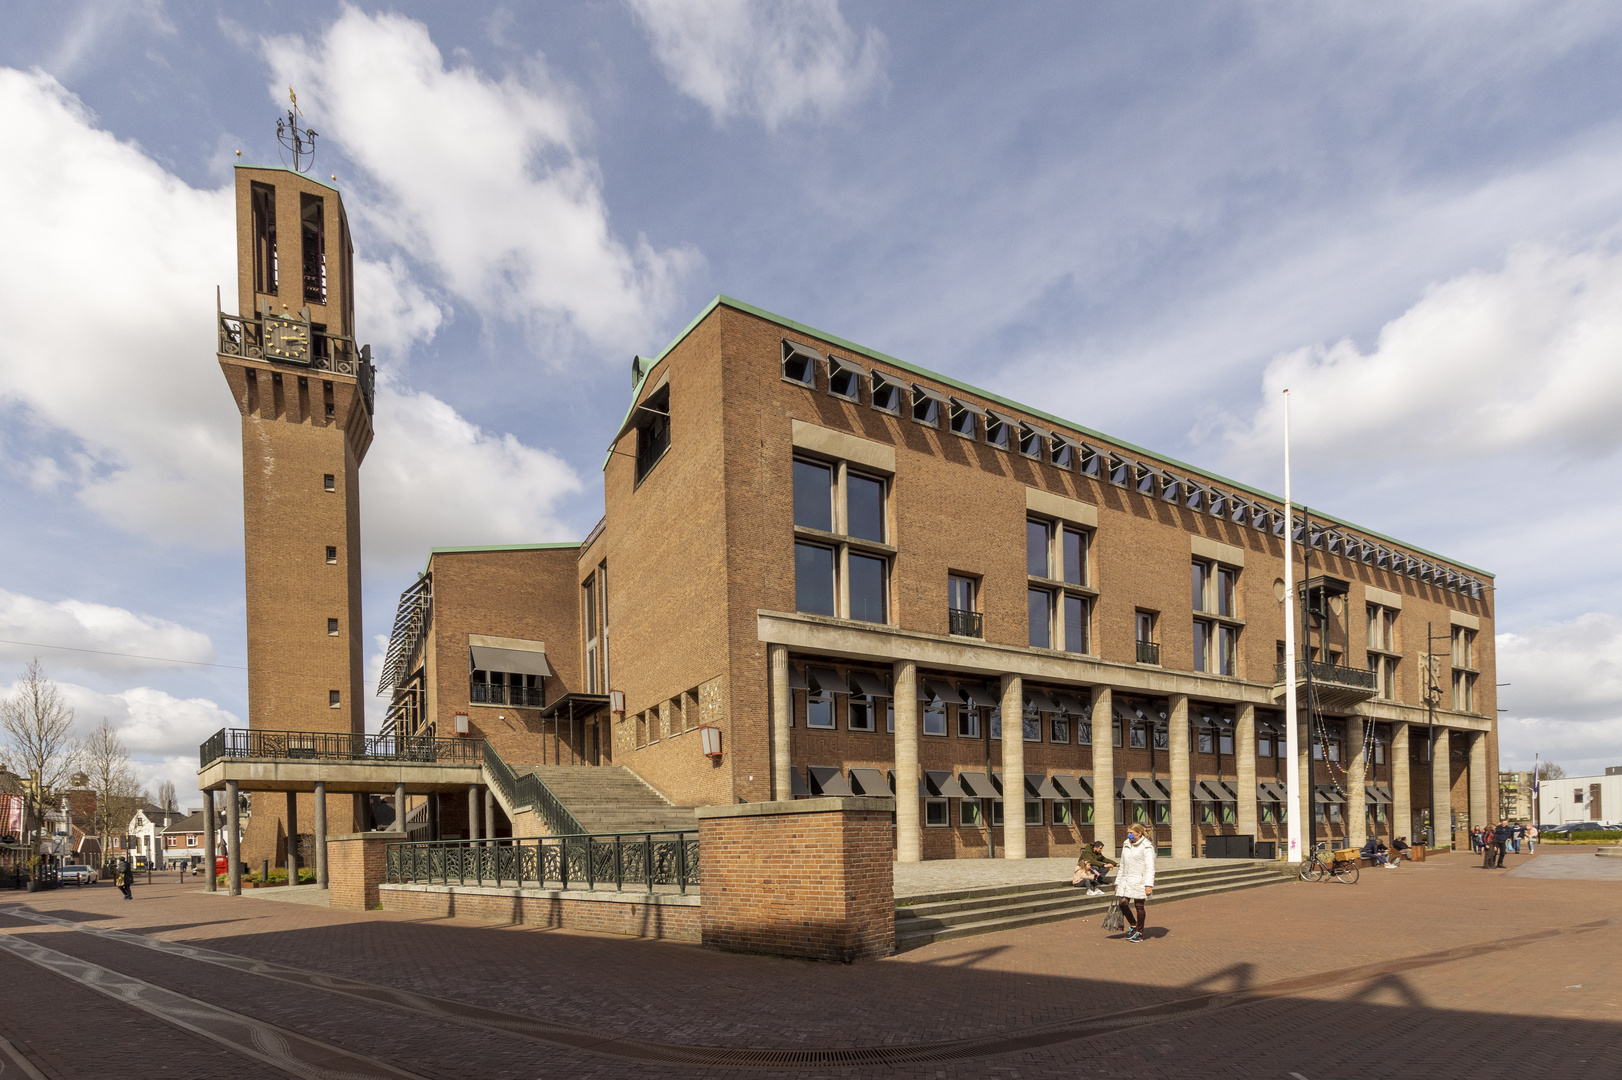 Hengelo - Burgemeester Jansenplein - Town Hall - 02